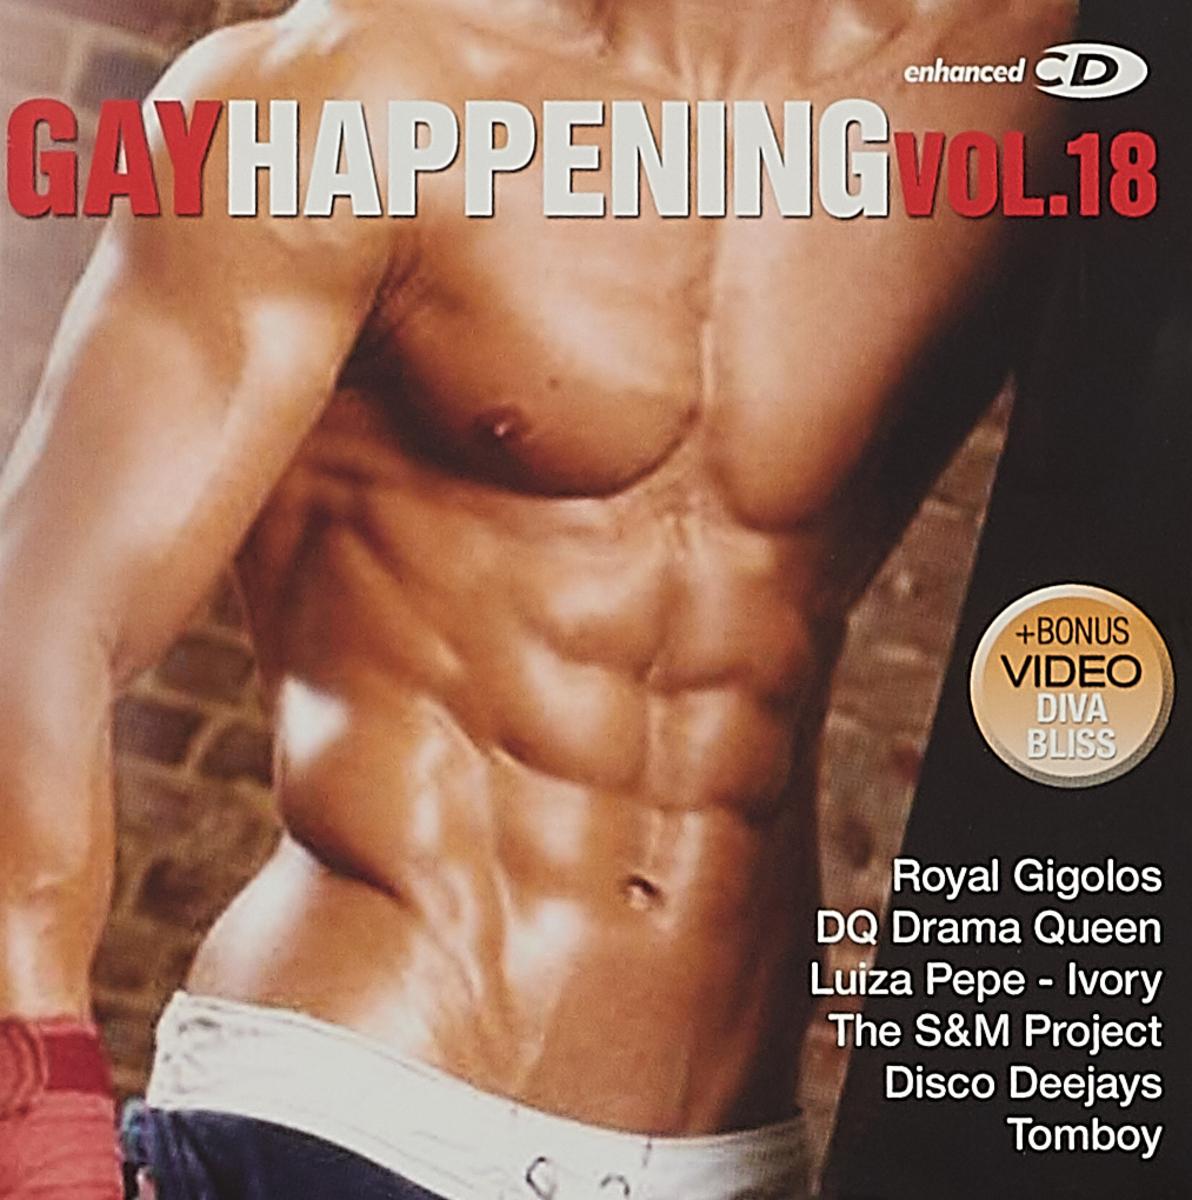 Gay Happening Vol.18 gay happening vol 18